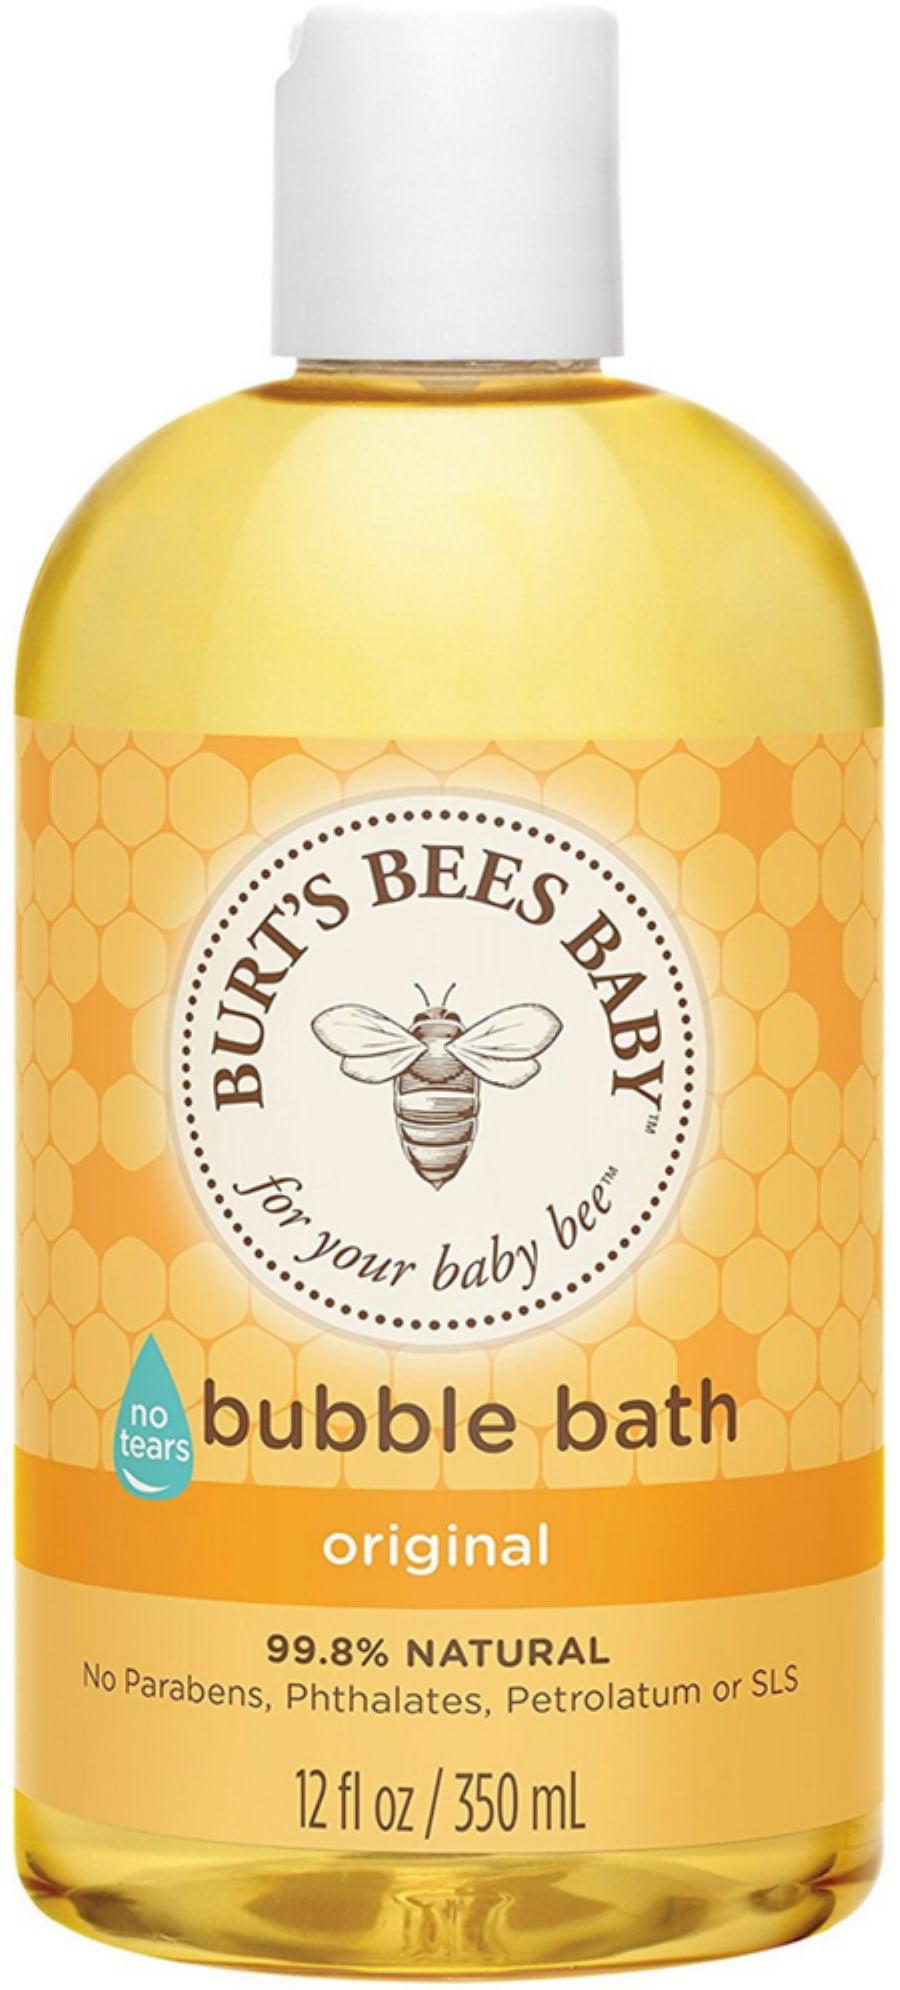 6 Pack Burt's Bees Baby Bee Tear Free Bubble Bath, 12 oz by Burt%27s Bees